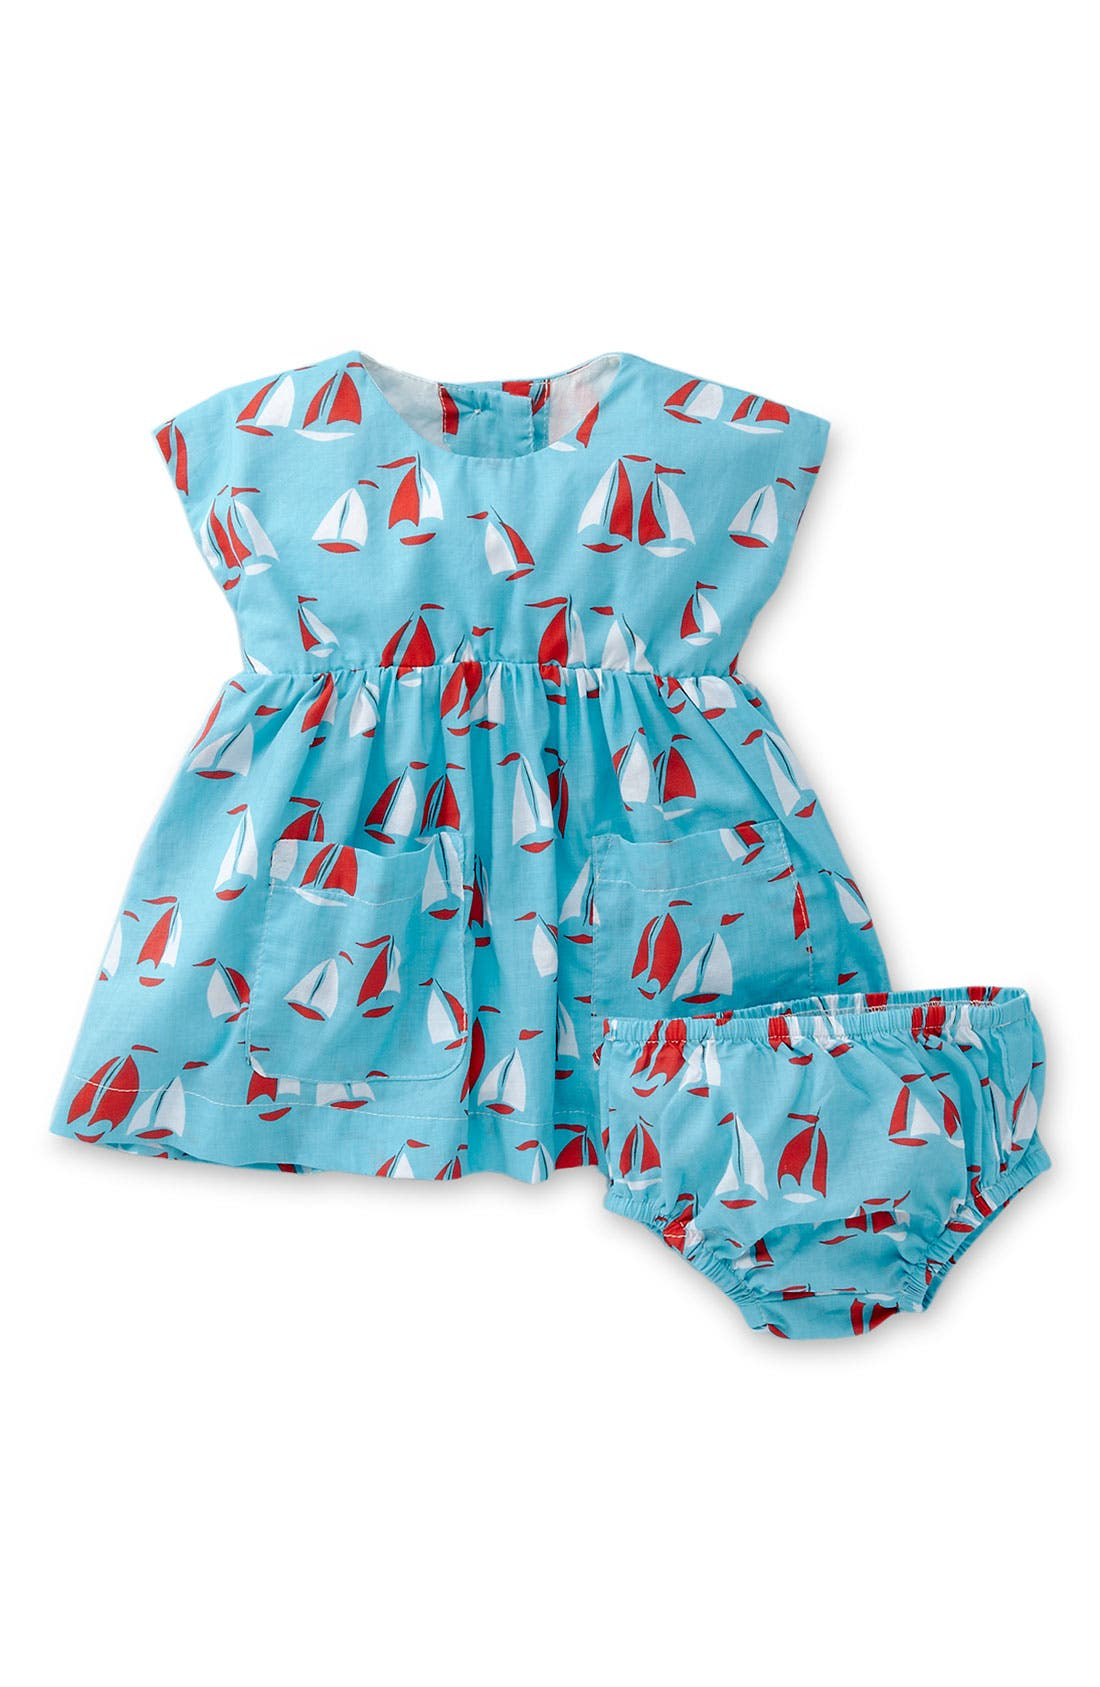 Main Image - Mini Boden 'Fifties' Dress (Infant)